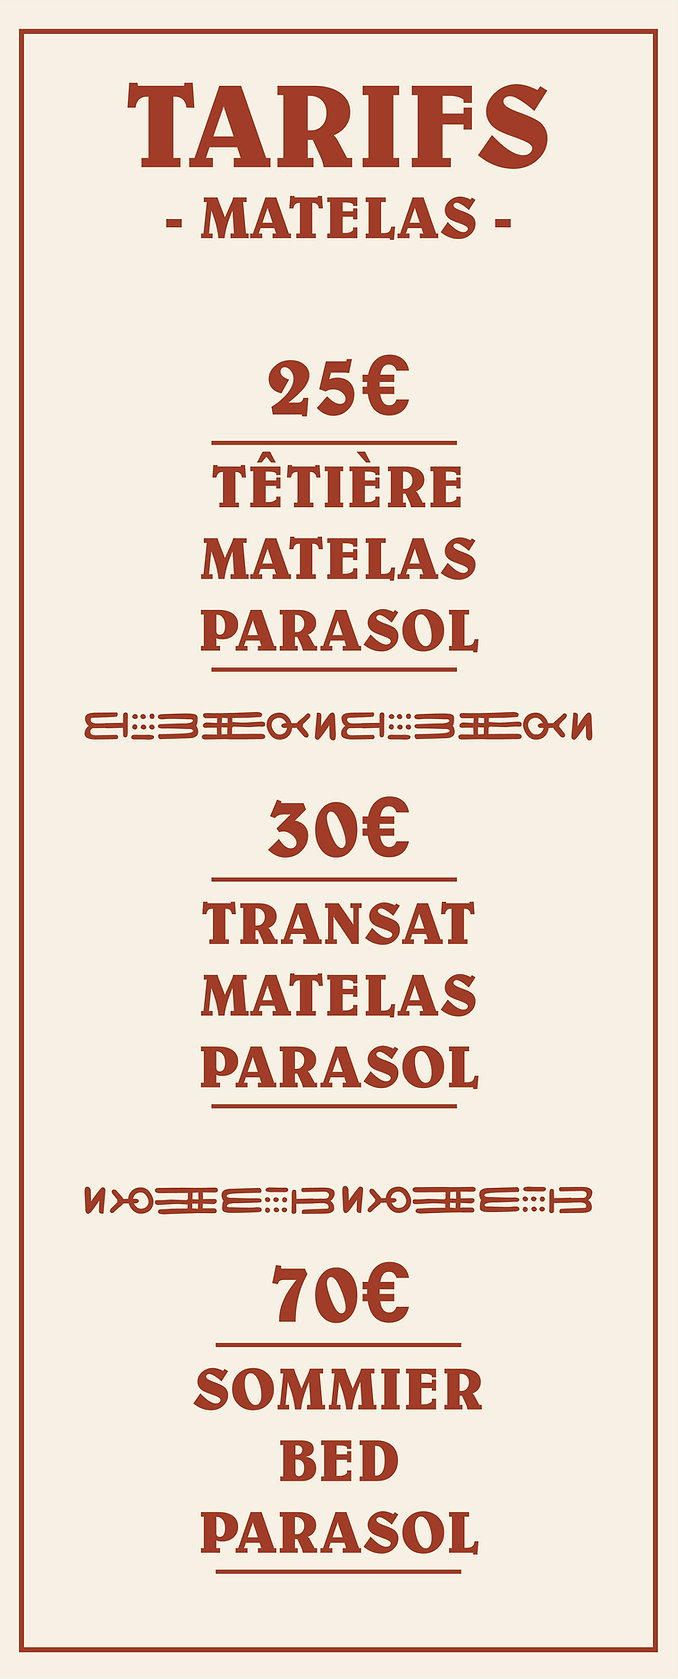 tarif-plage-playa_2021.jpg